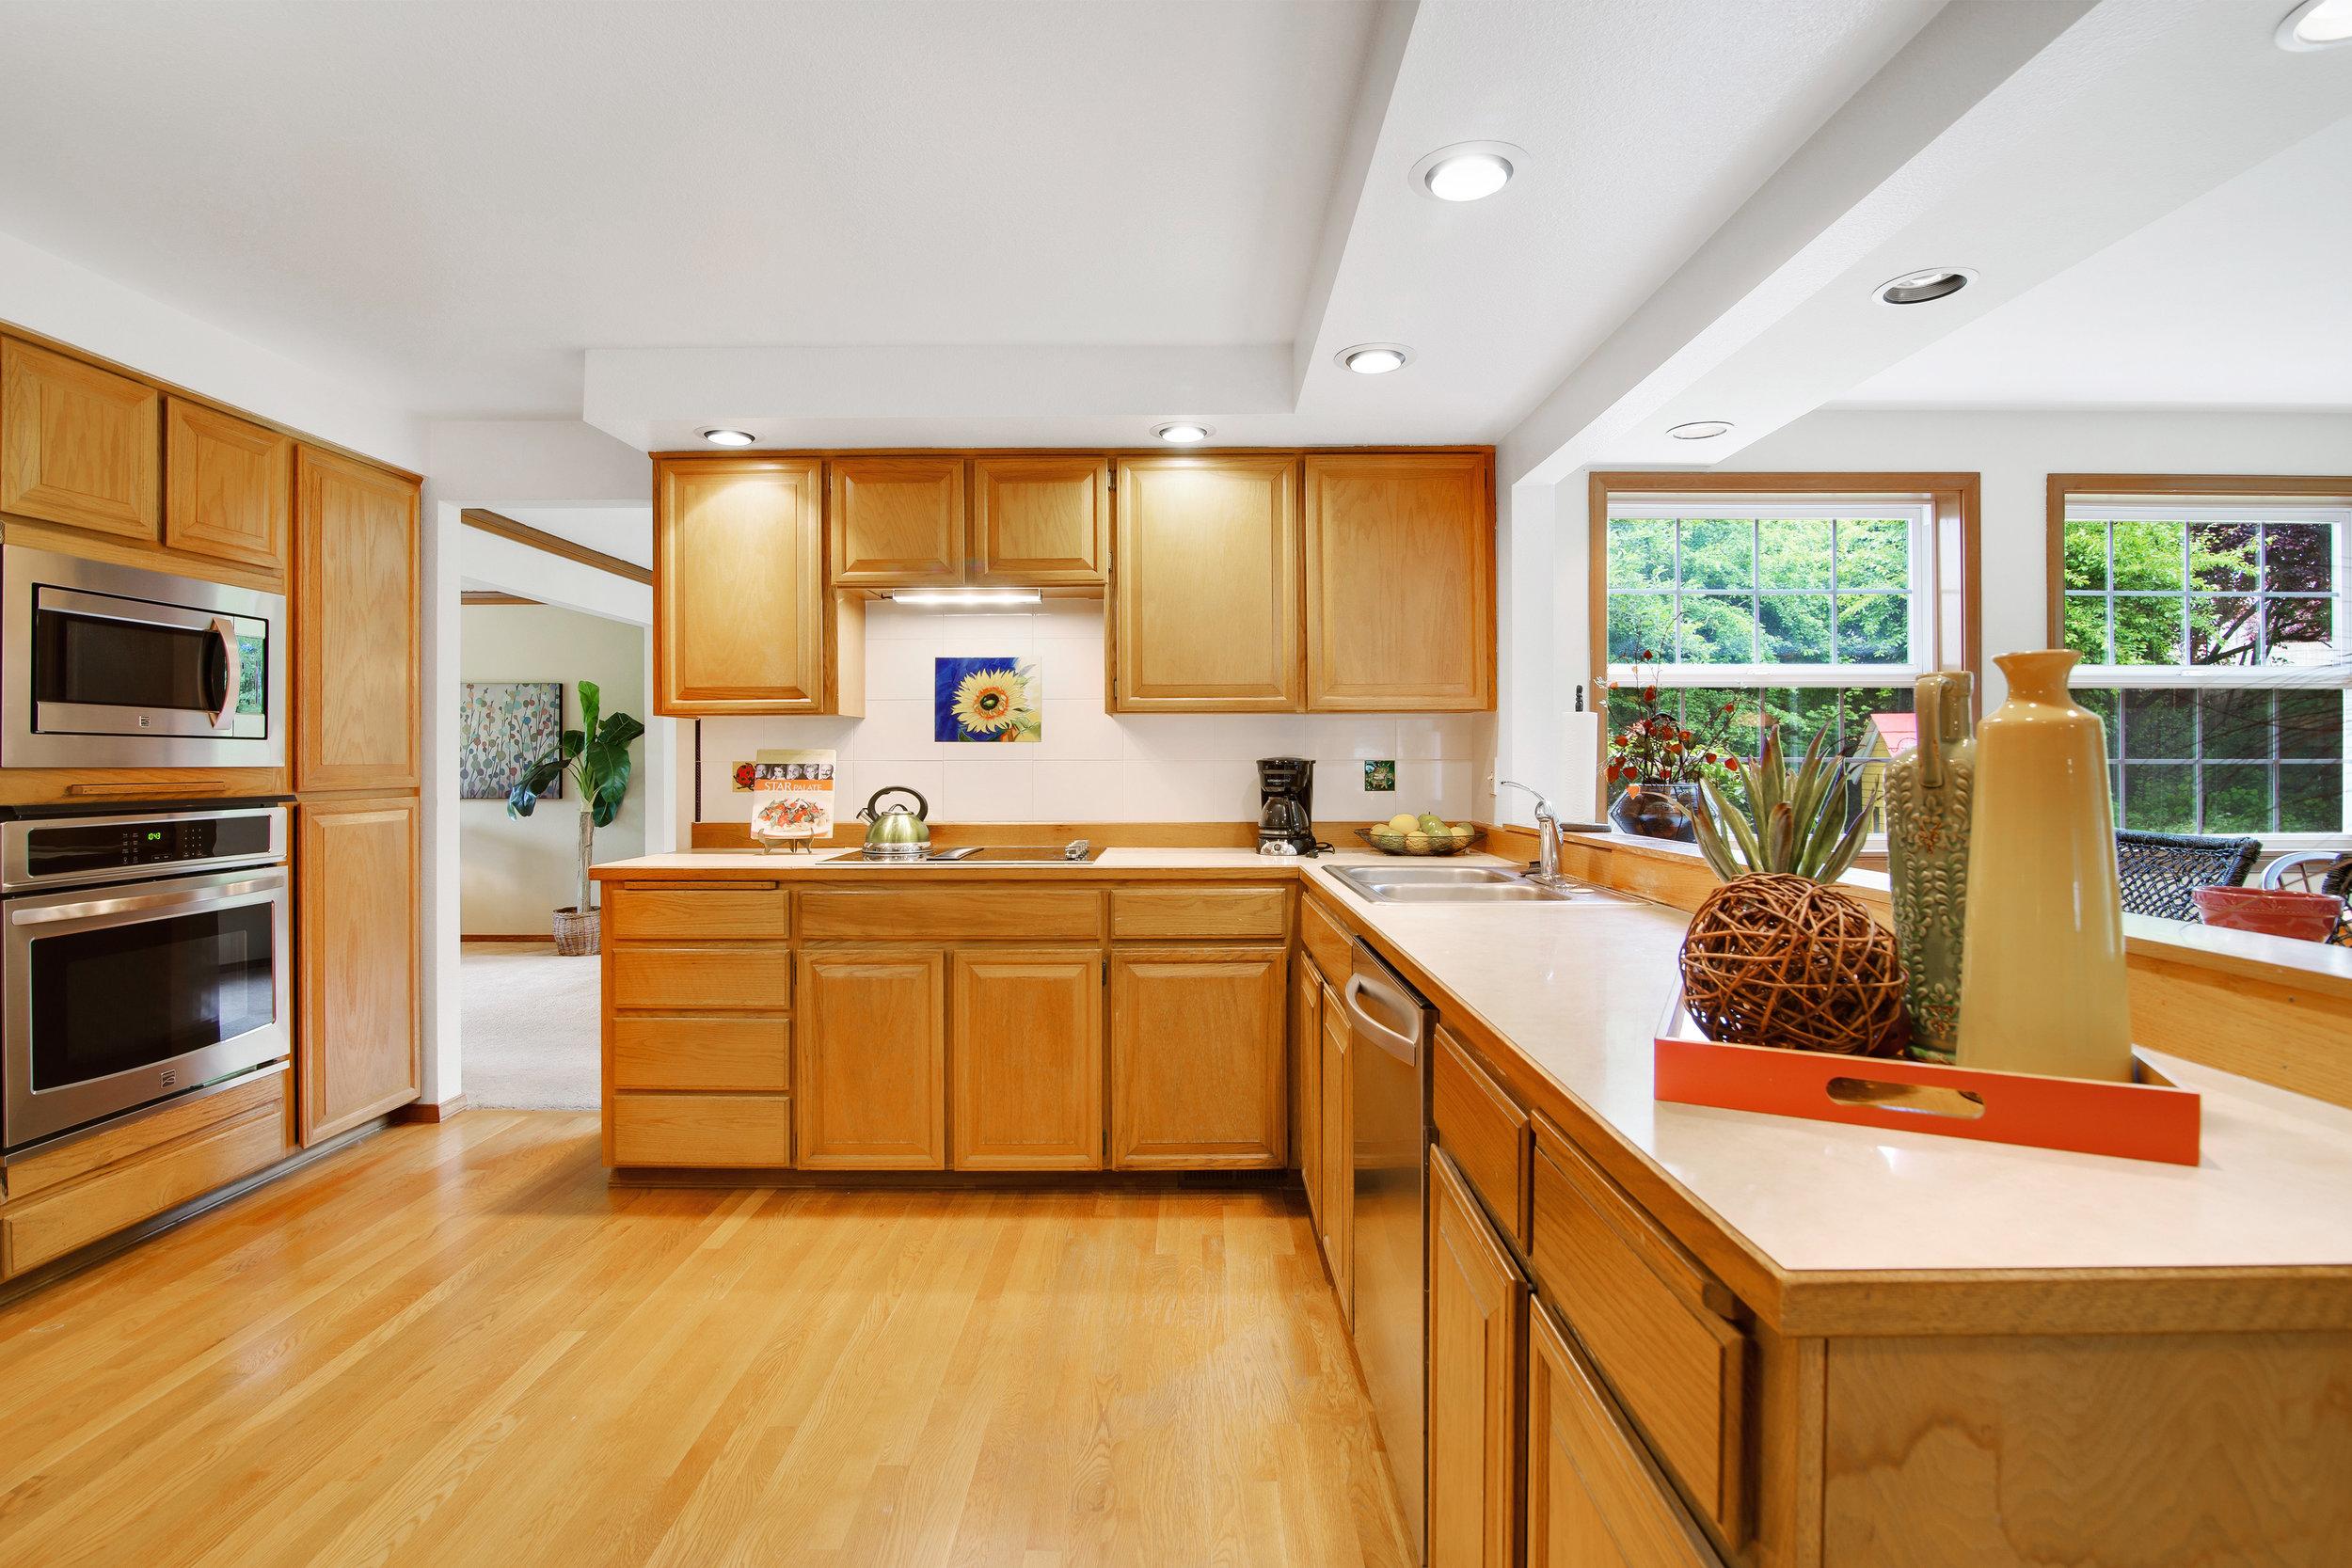 bothell_cul--de-sac_kitchen.jpg